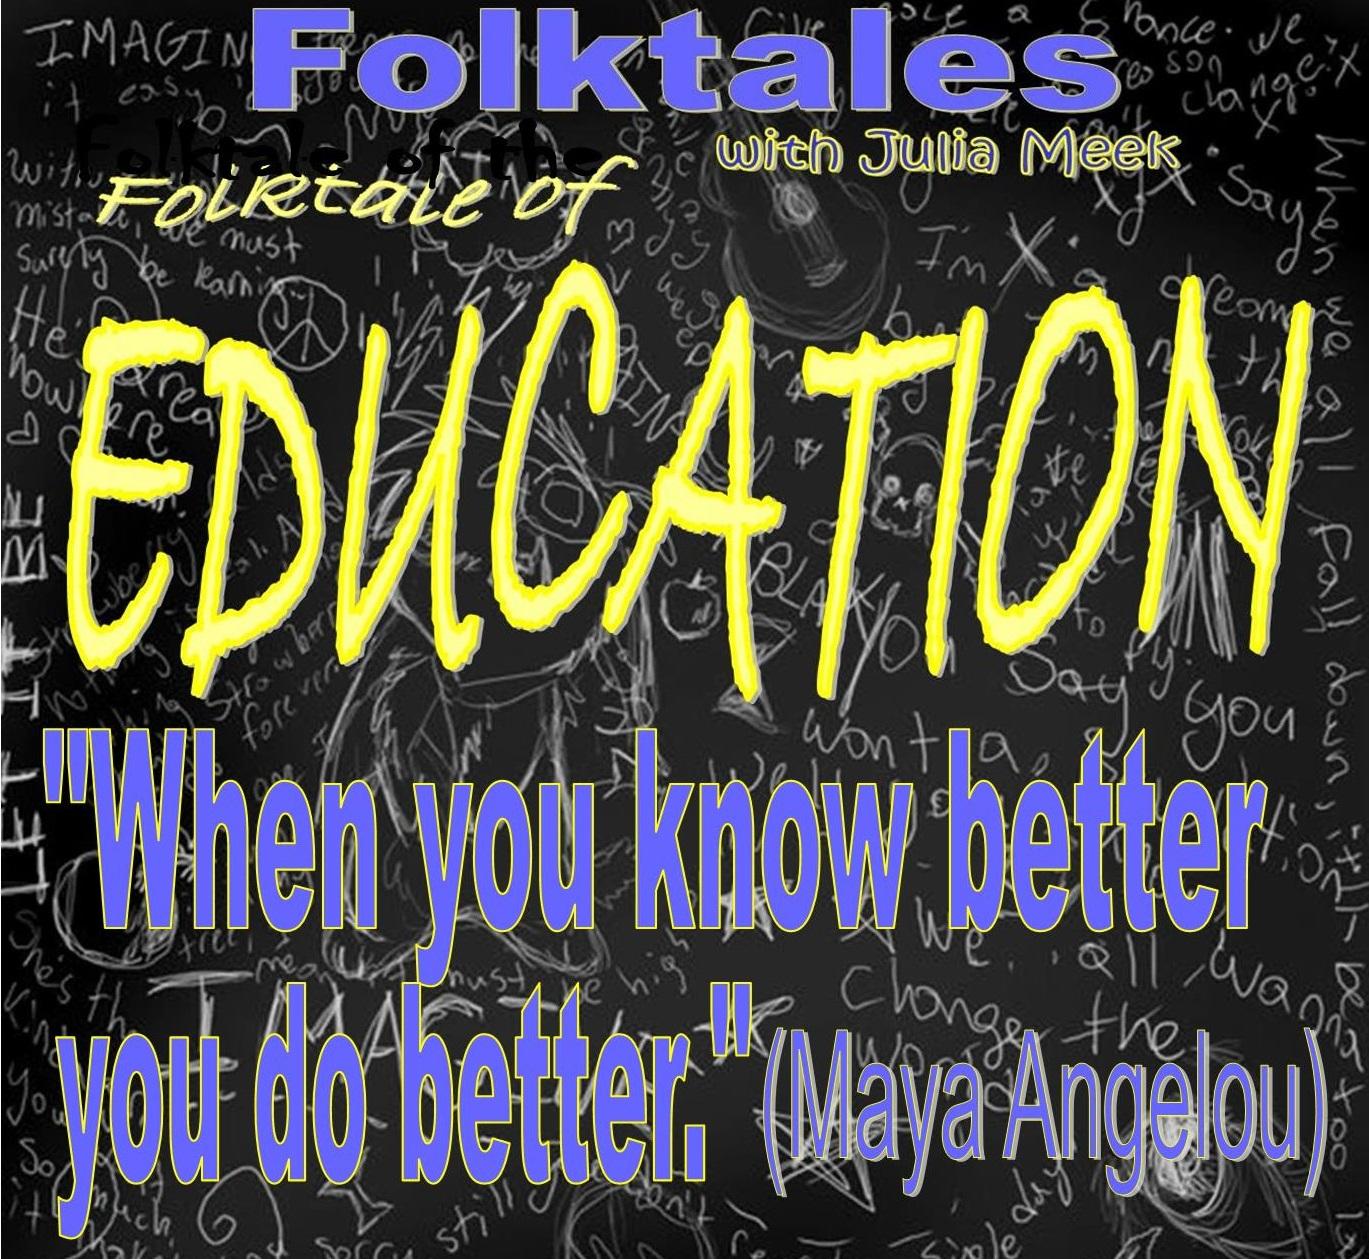 Caption: Folktale of Education, Credit: Julia Meek